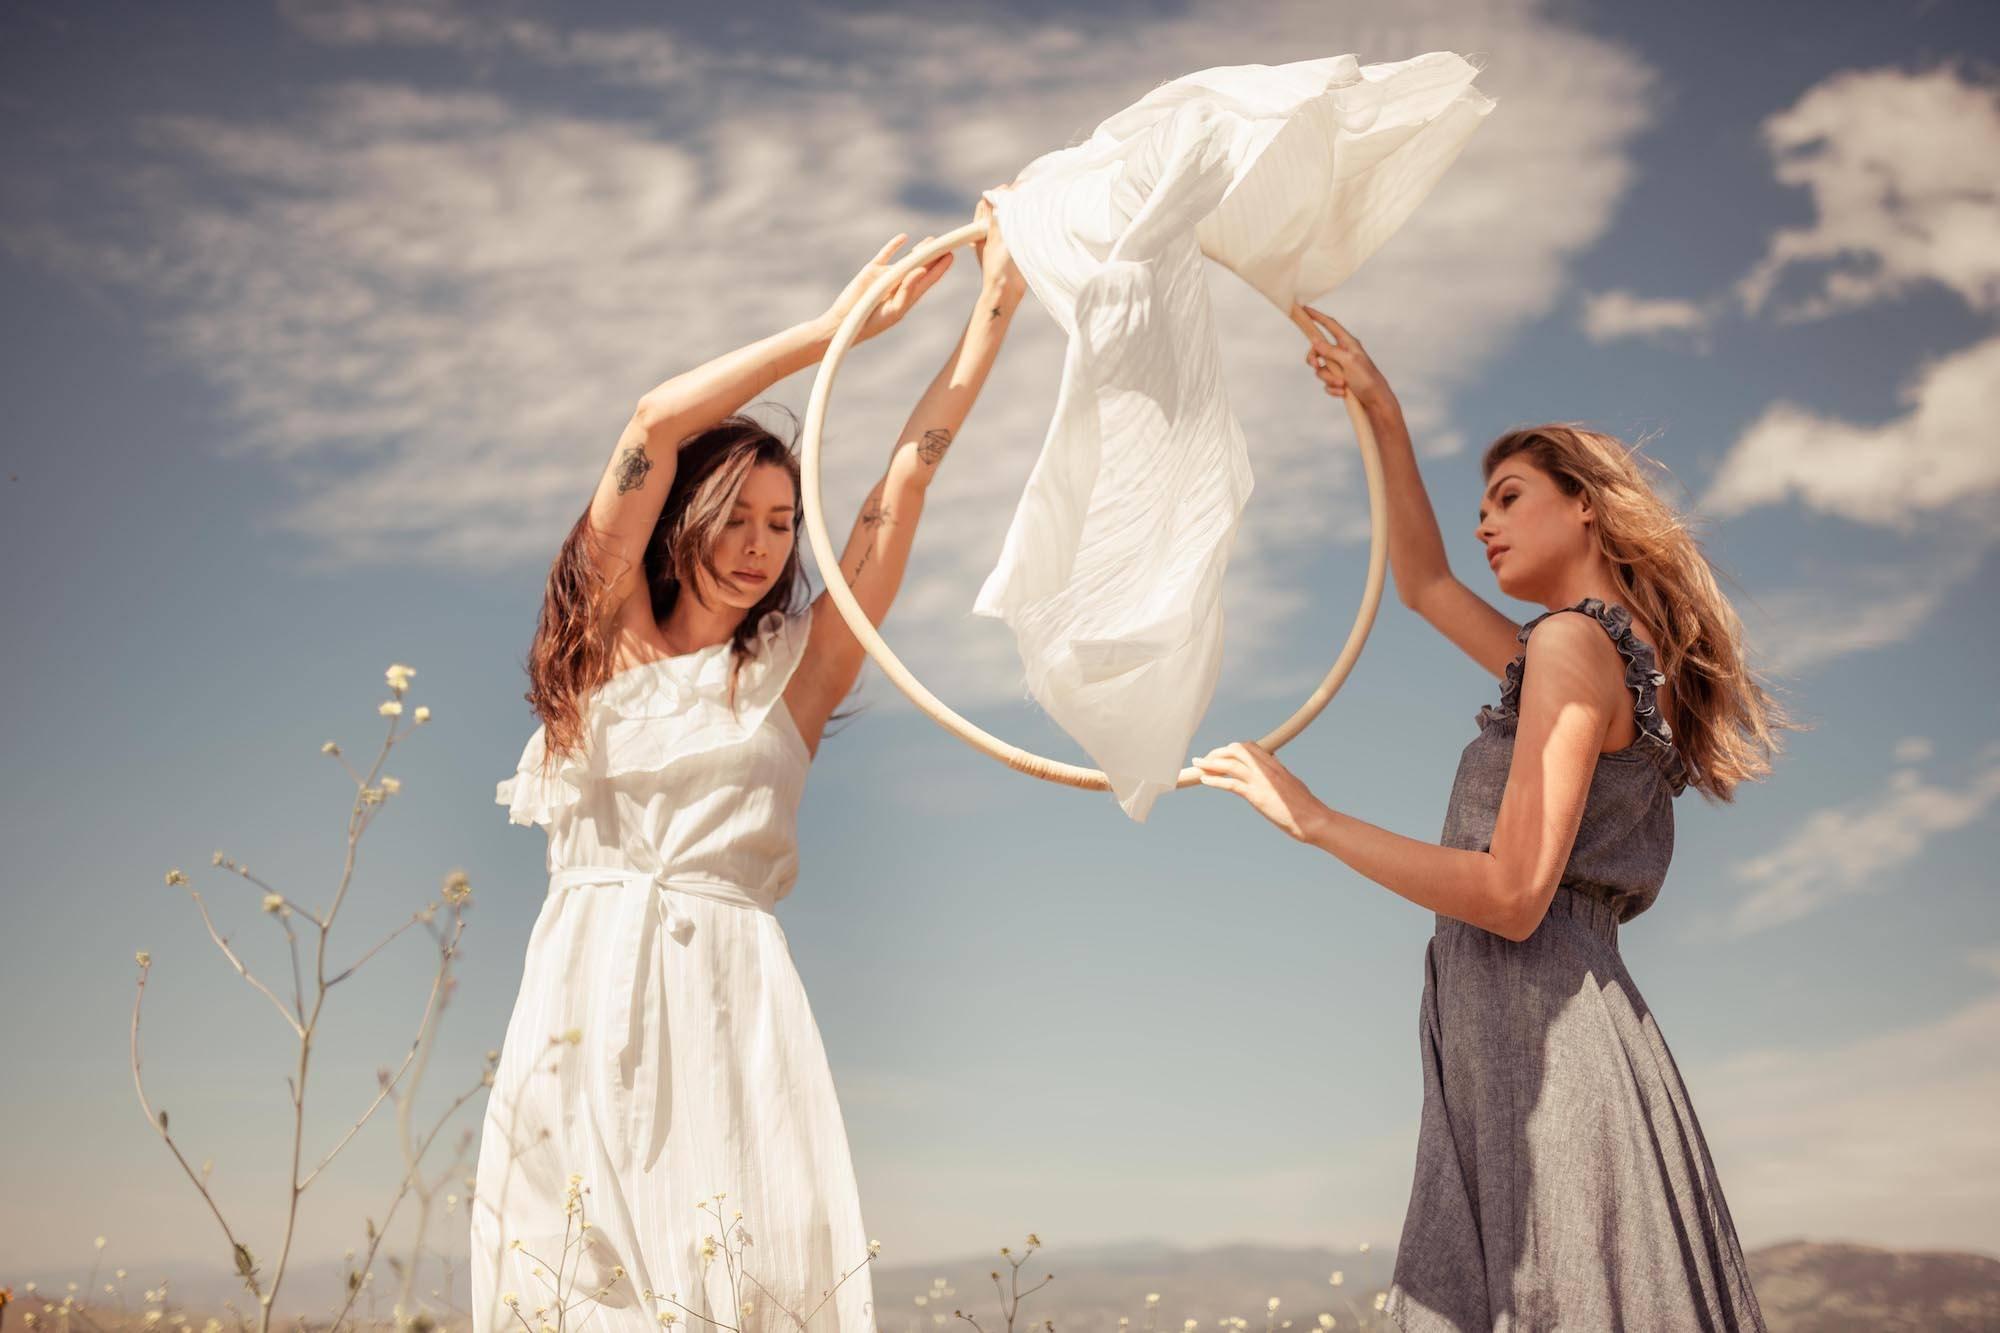 models in hemp dress and banana fabric dress